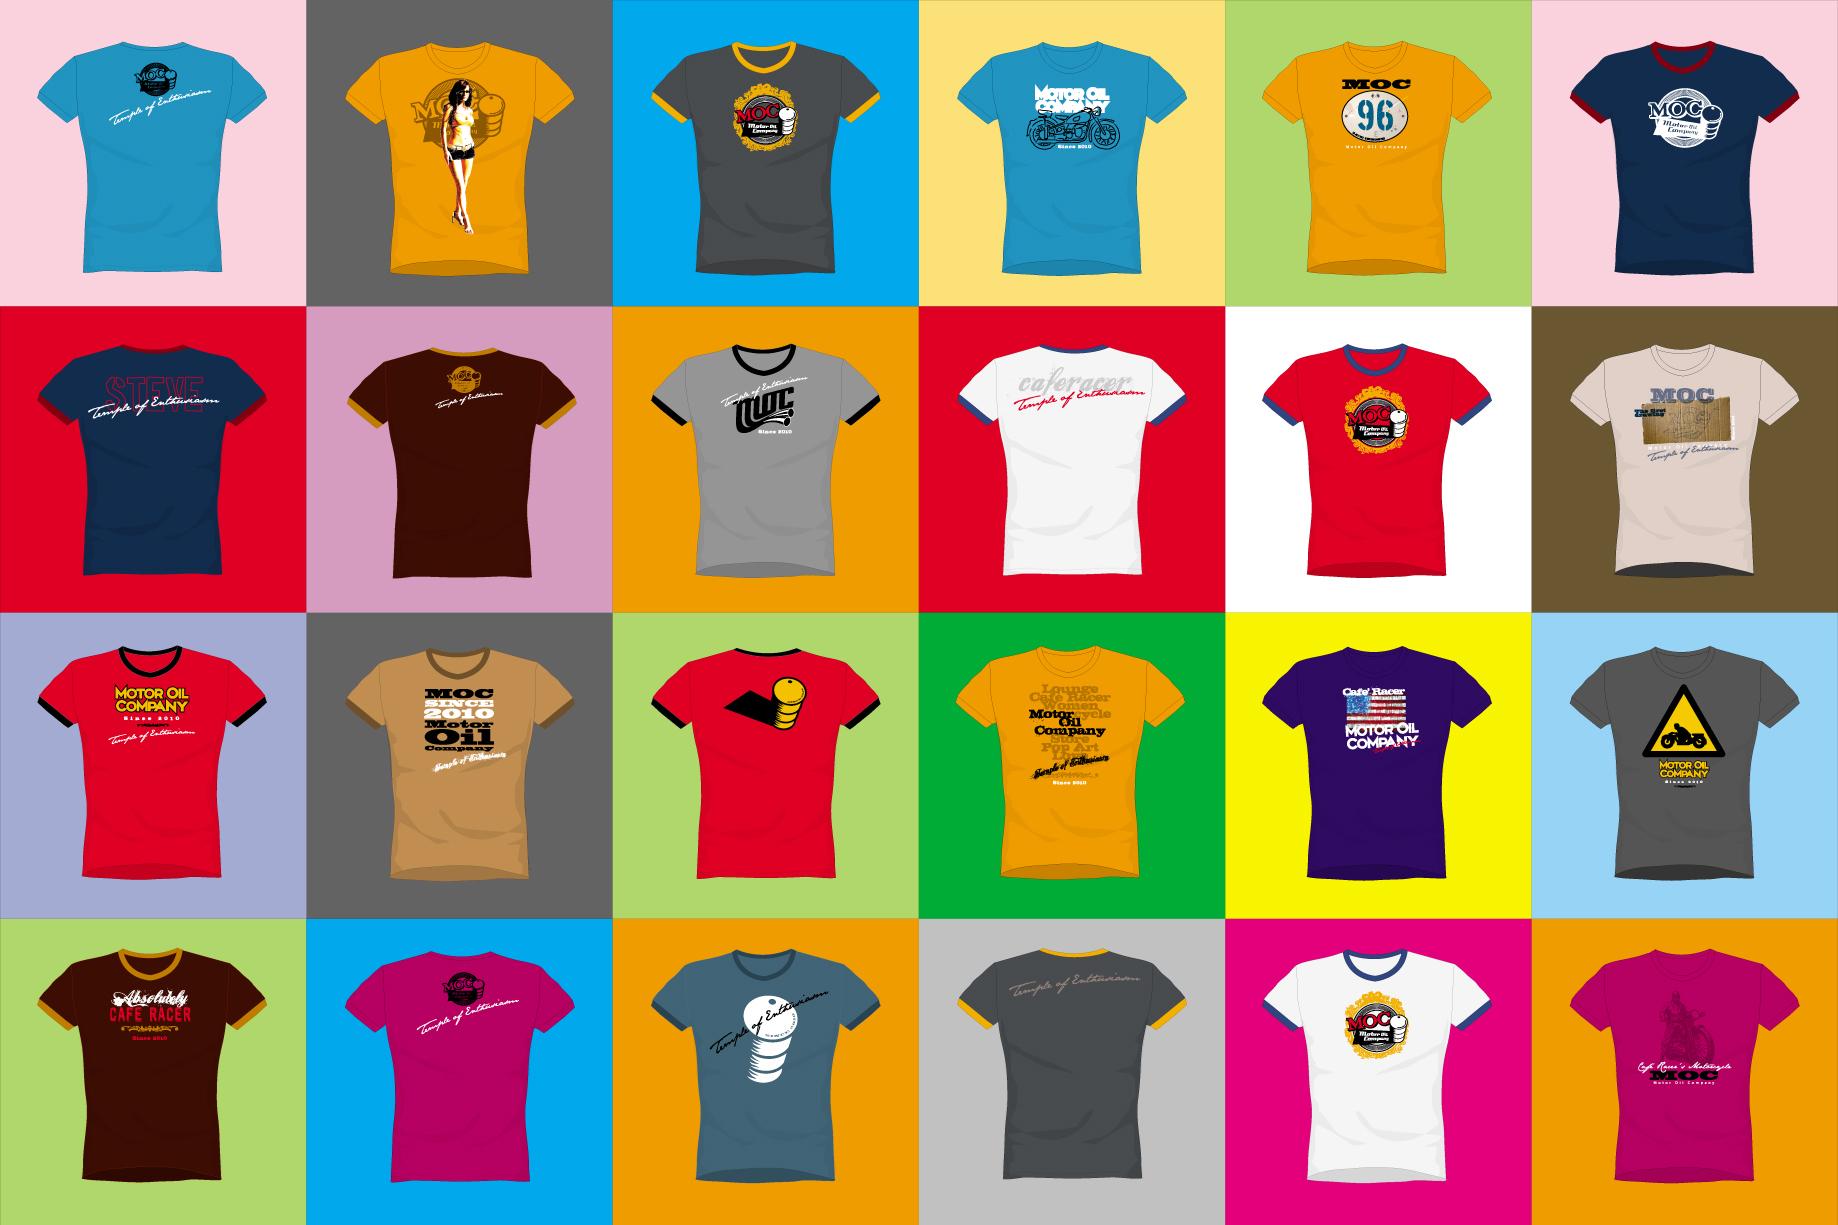 t-shirtmoc